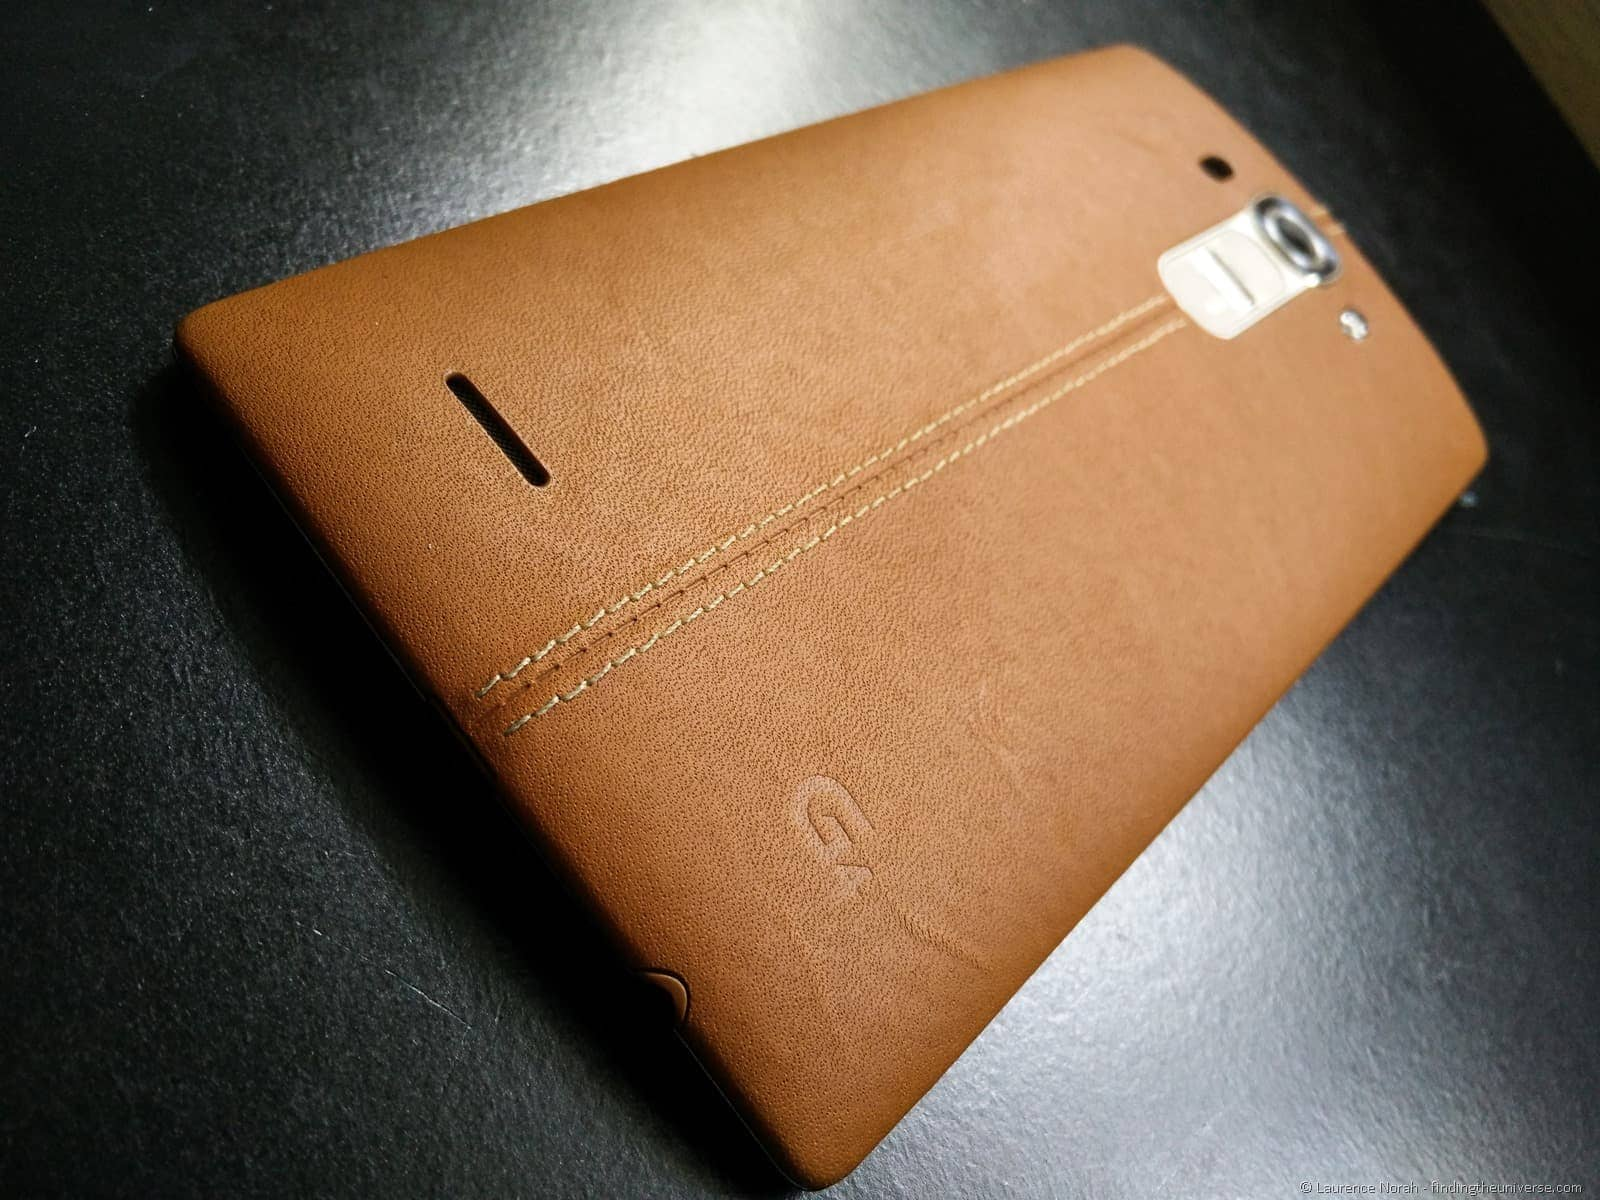 LG G4 close up back